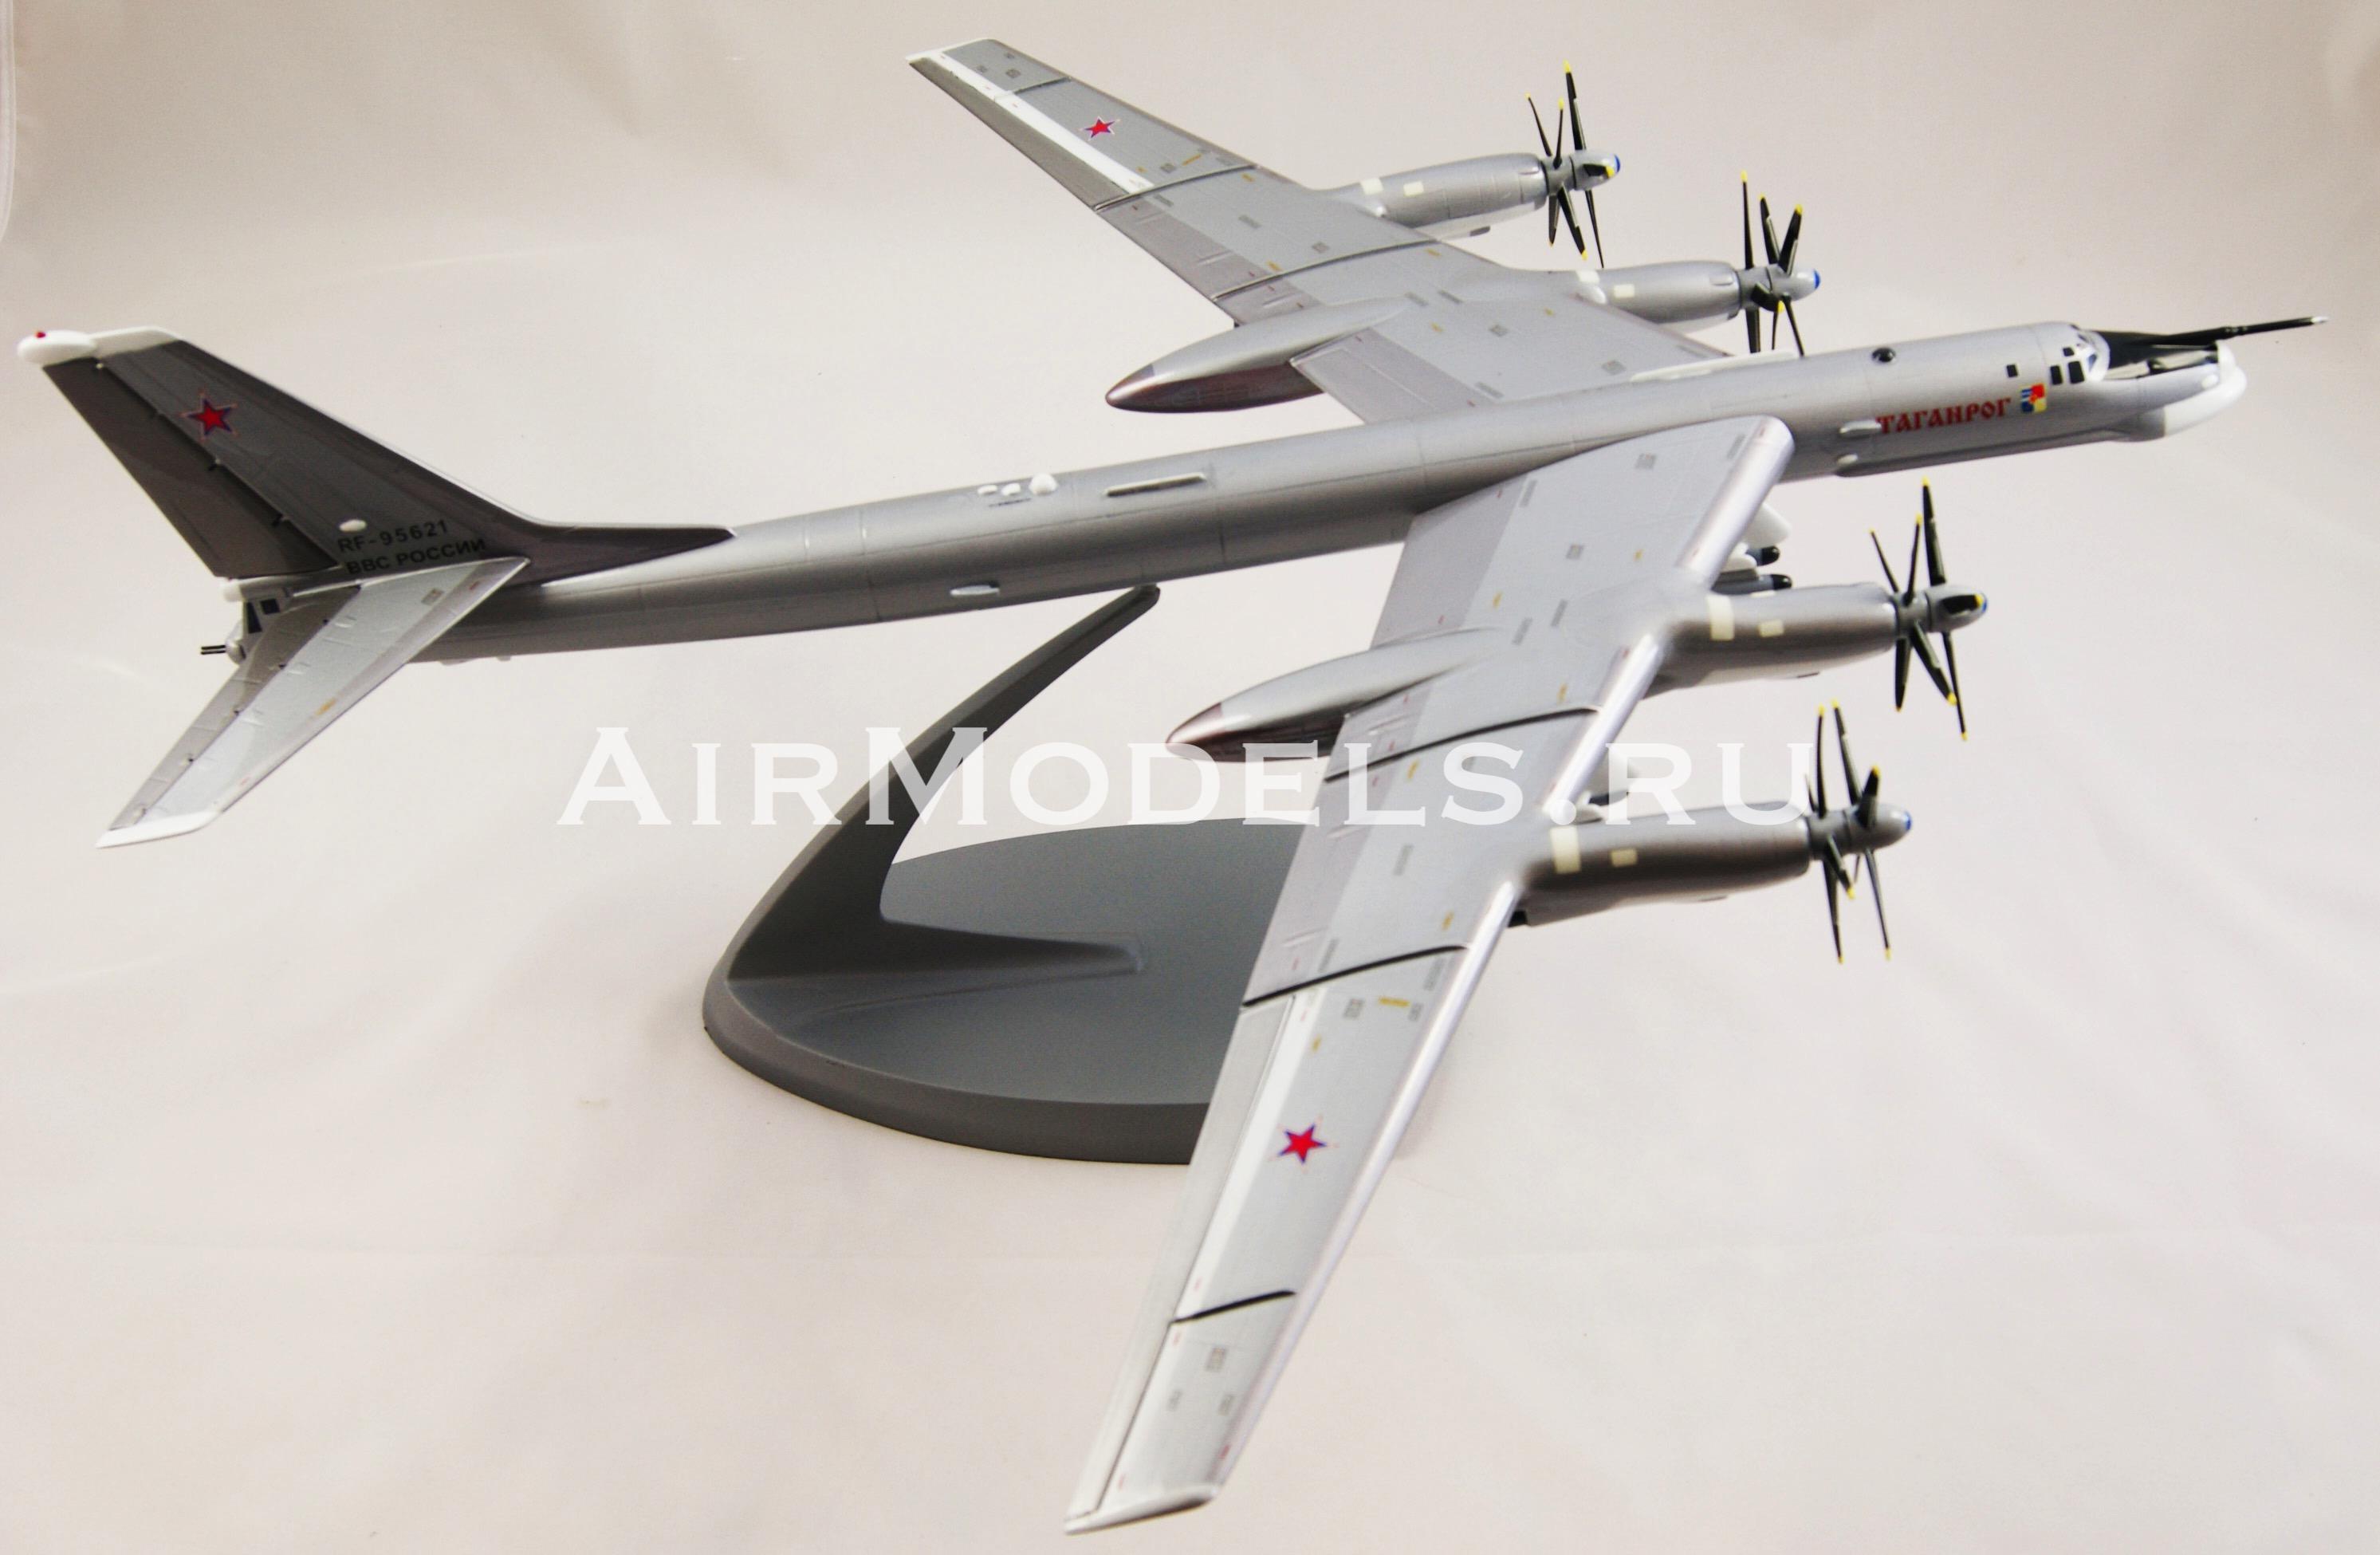 Модель самолета Ту-95МС (Масштаб 1:72)